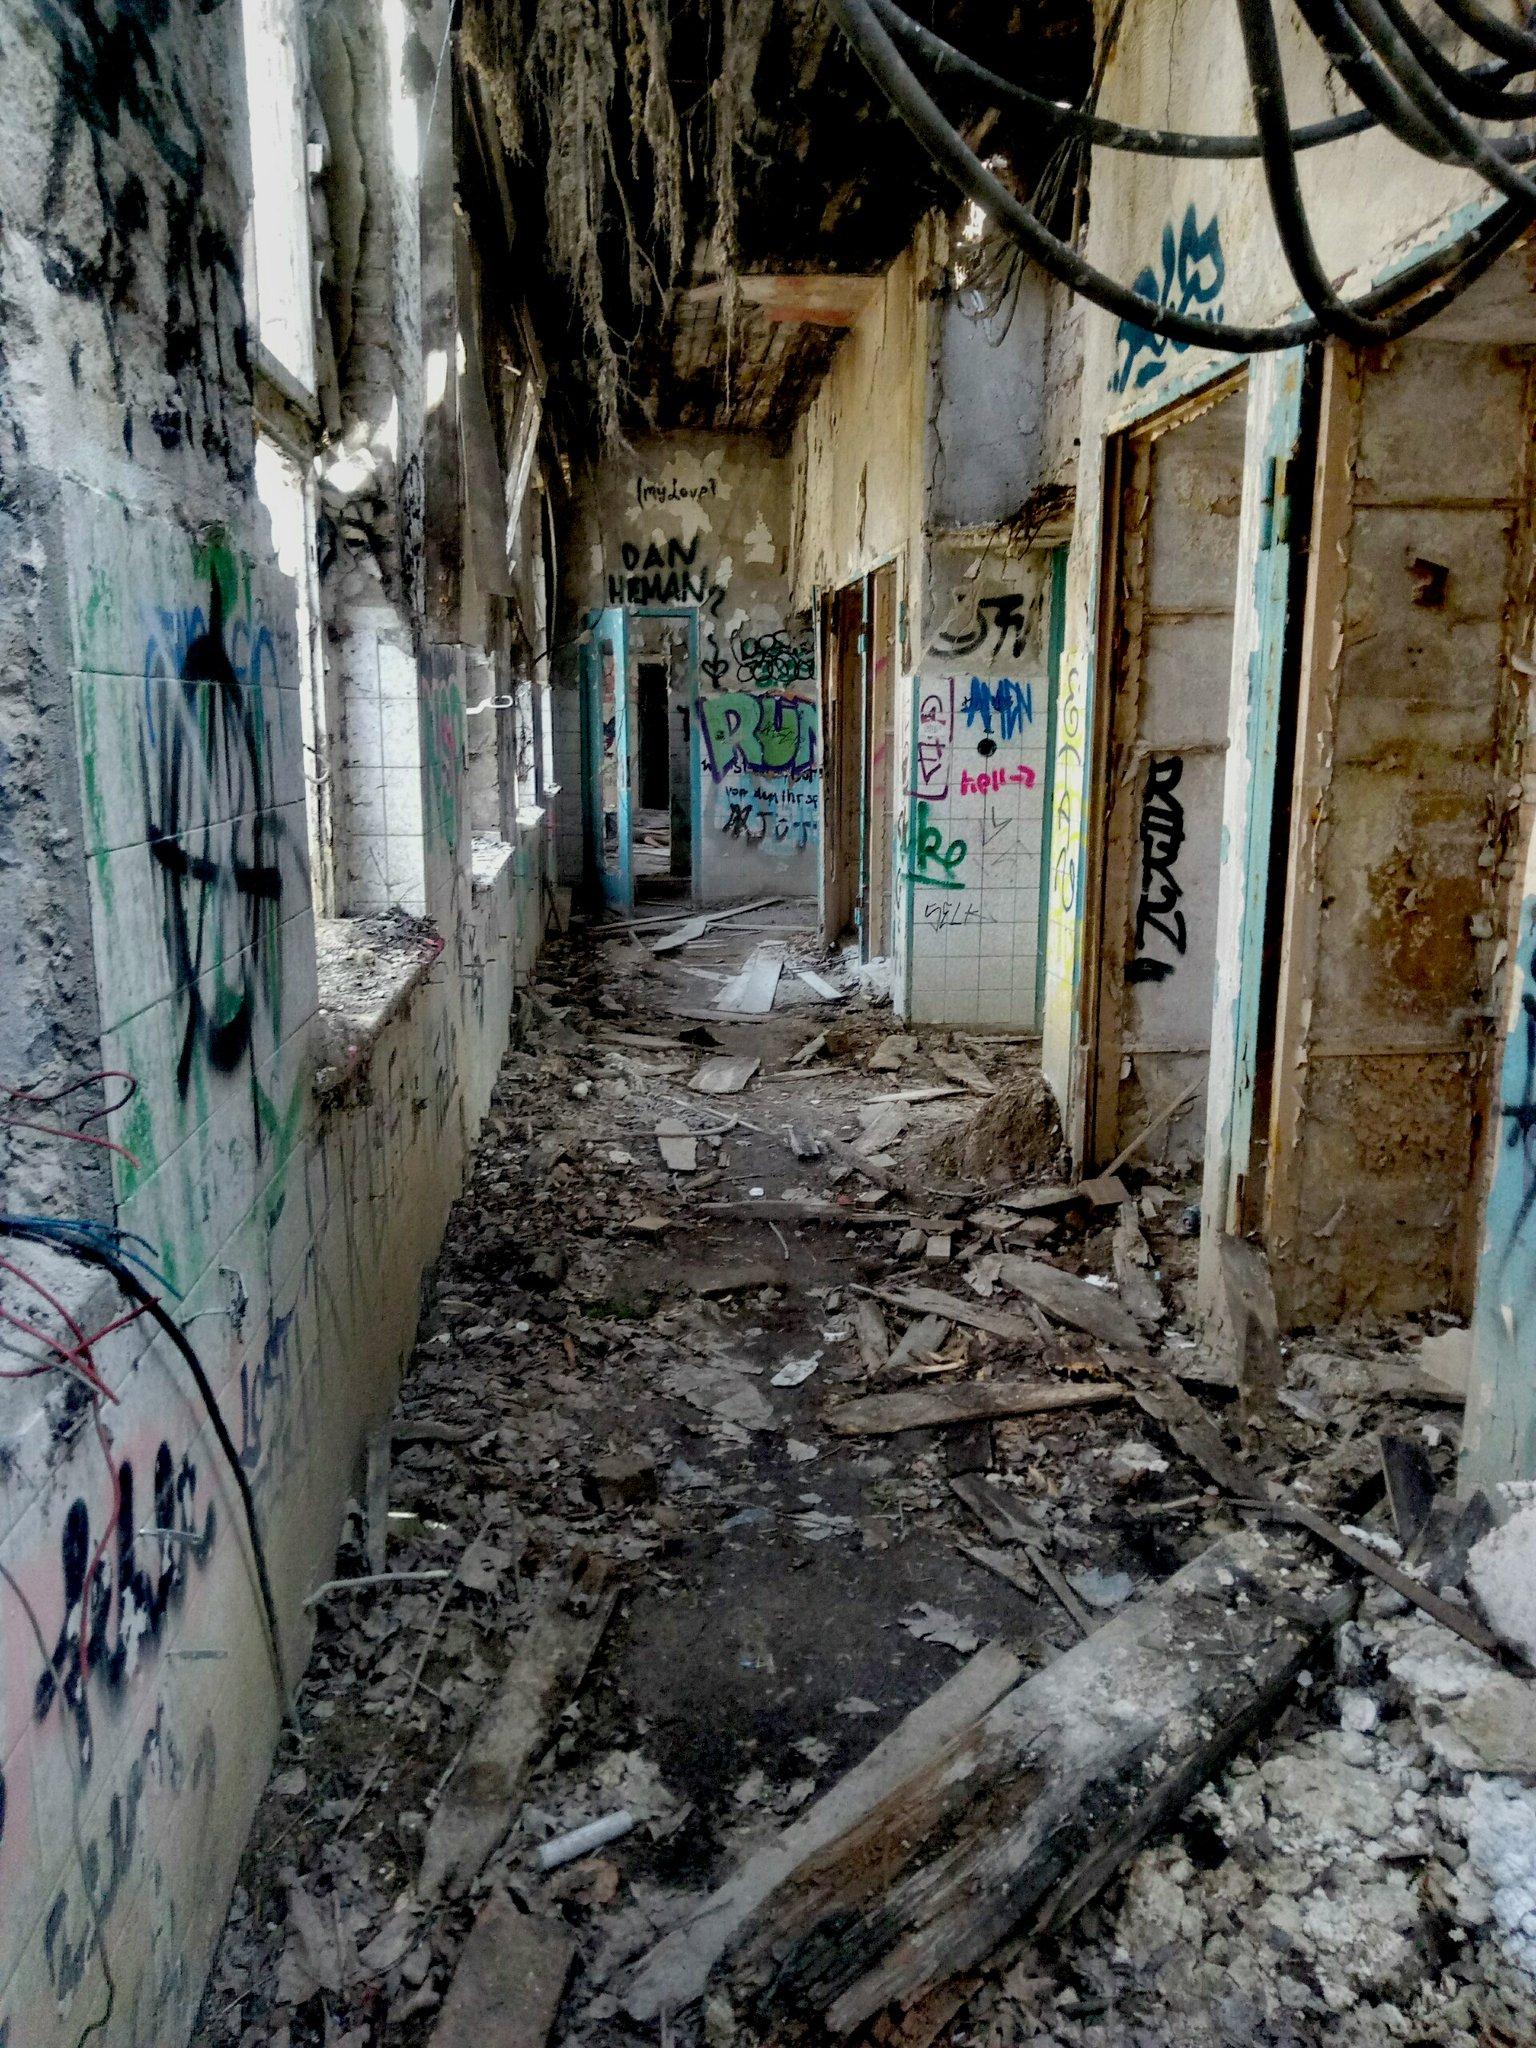 ospedale fantasma 1